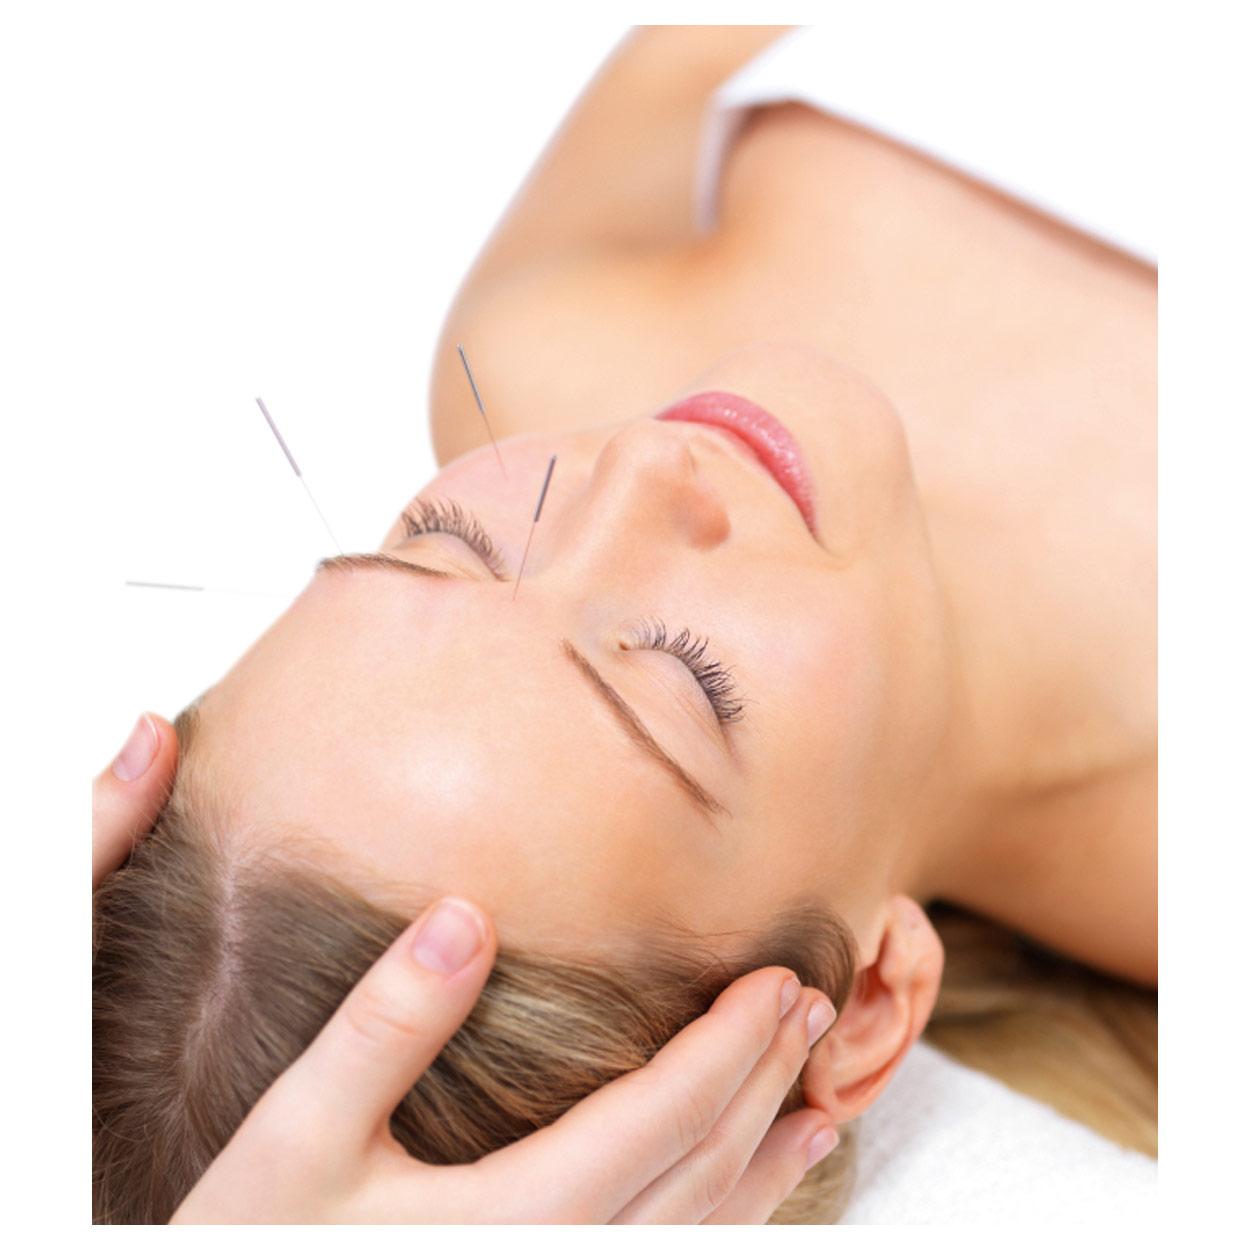 Indexbild 18 - Akupunkturnadeln mit Silbergriff, Akupunktur